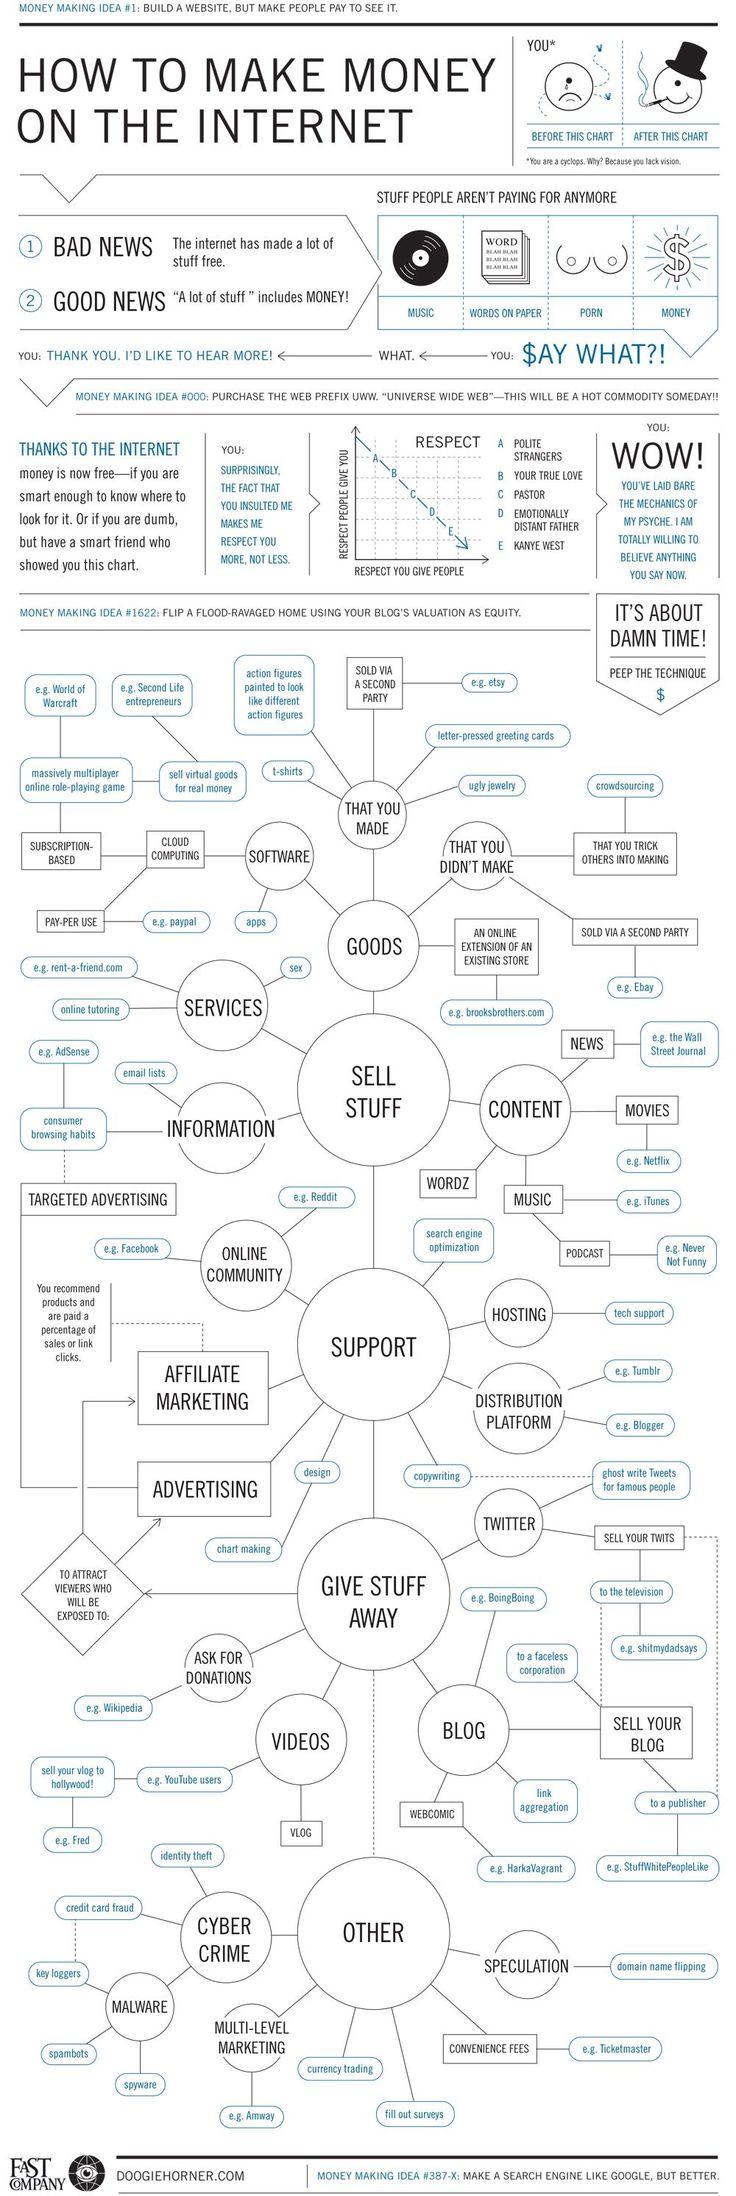 How To Make Money Online - #flowchart #infographic #makemoney